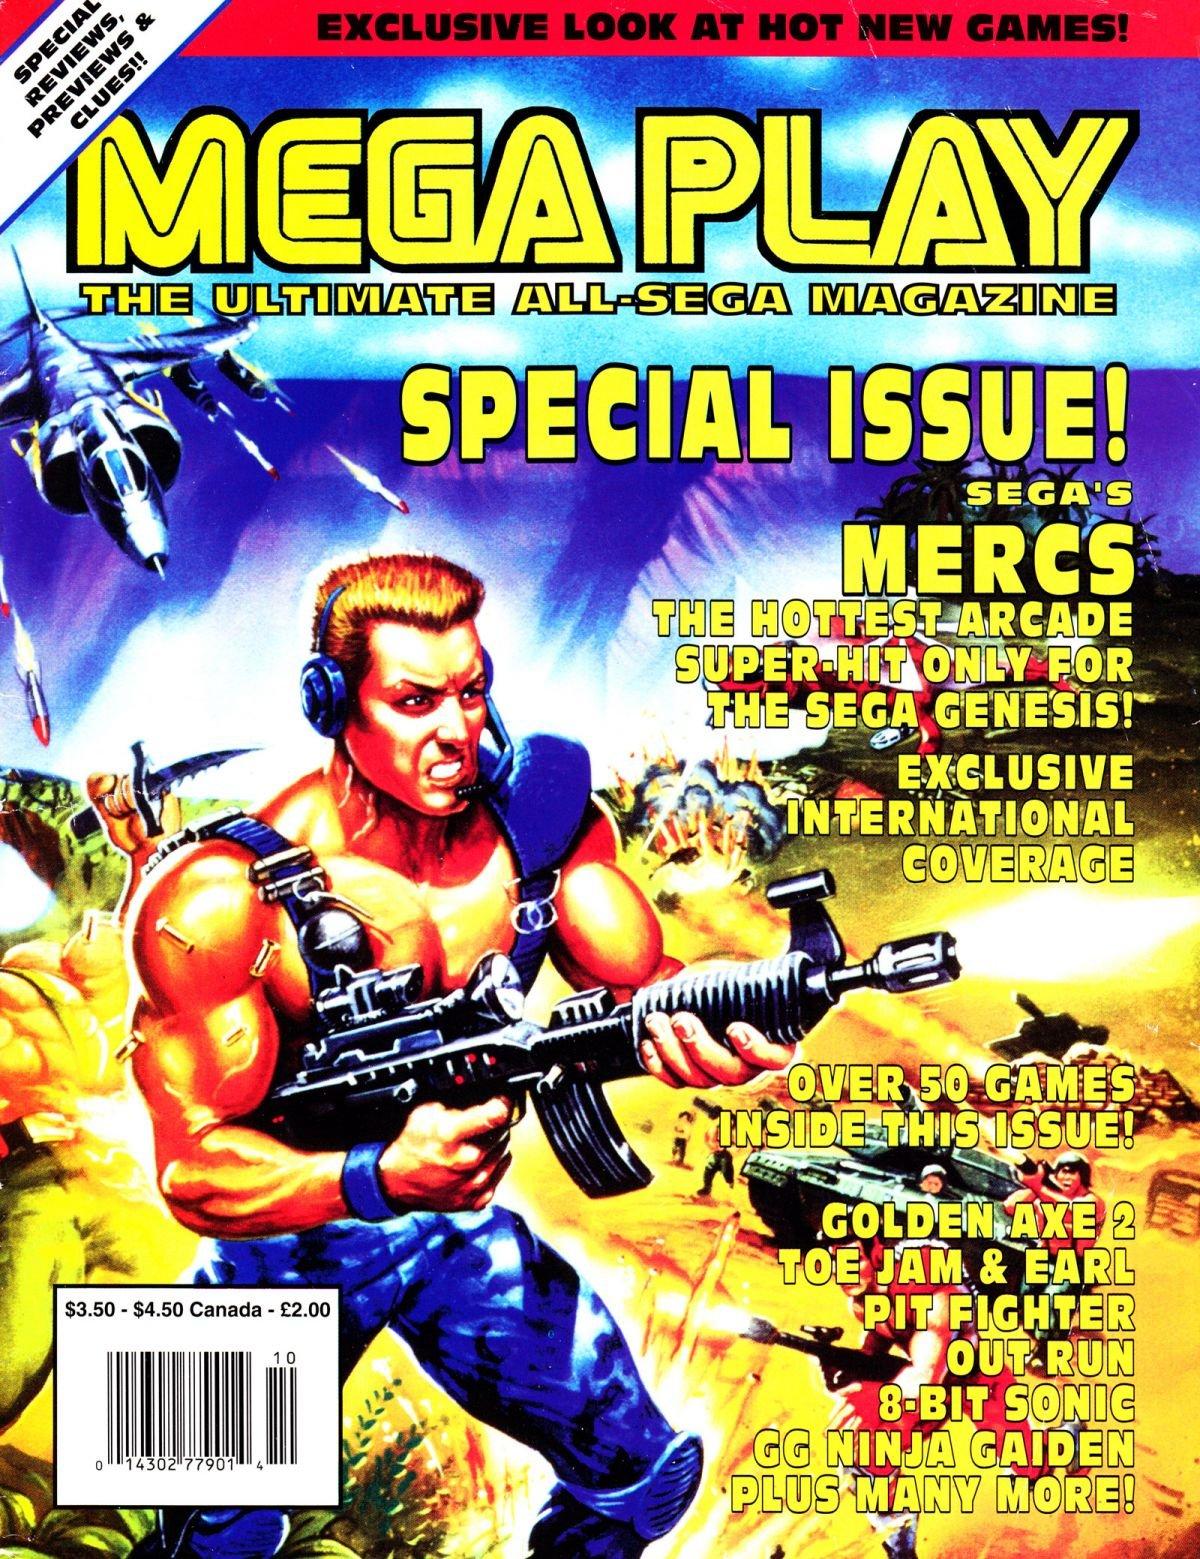 Mega Play Vol.2 No.5 September/October 1991